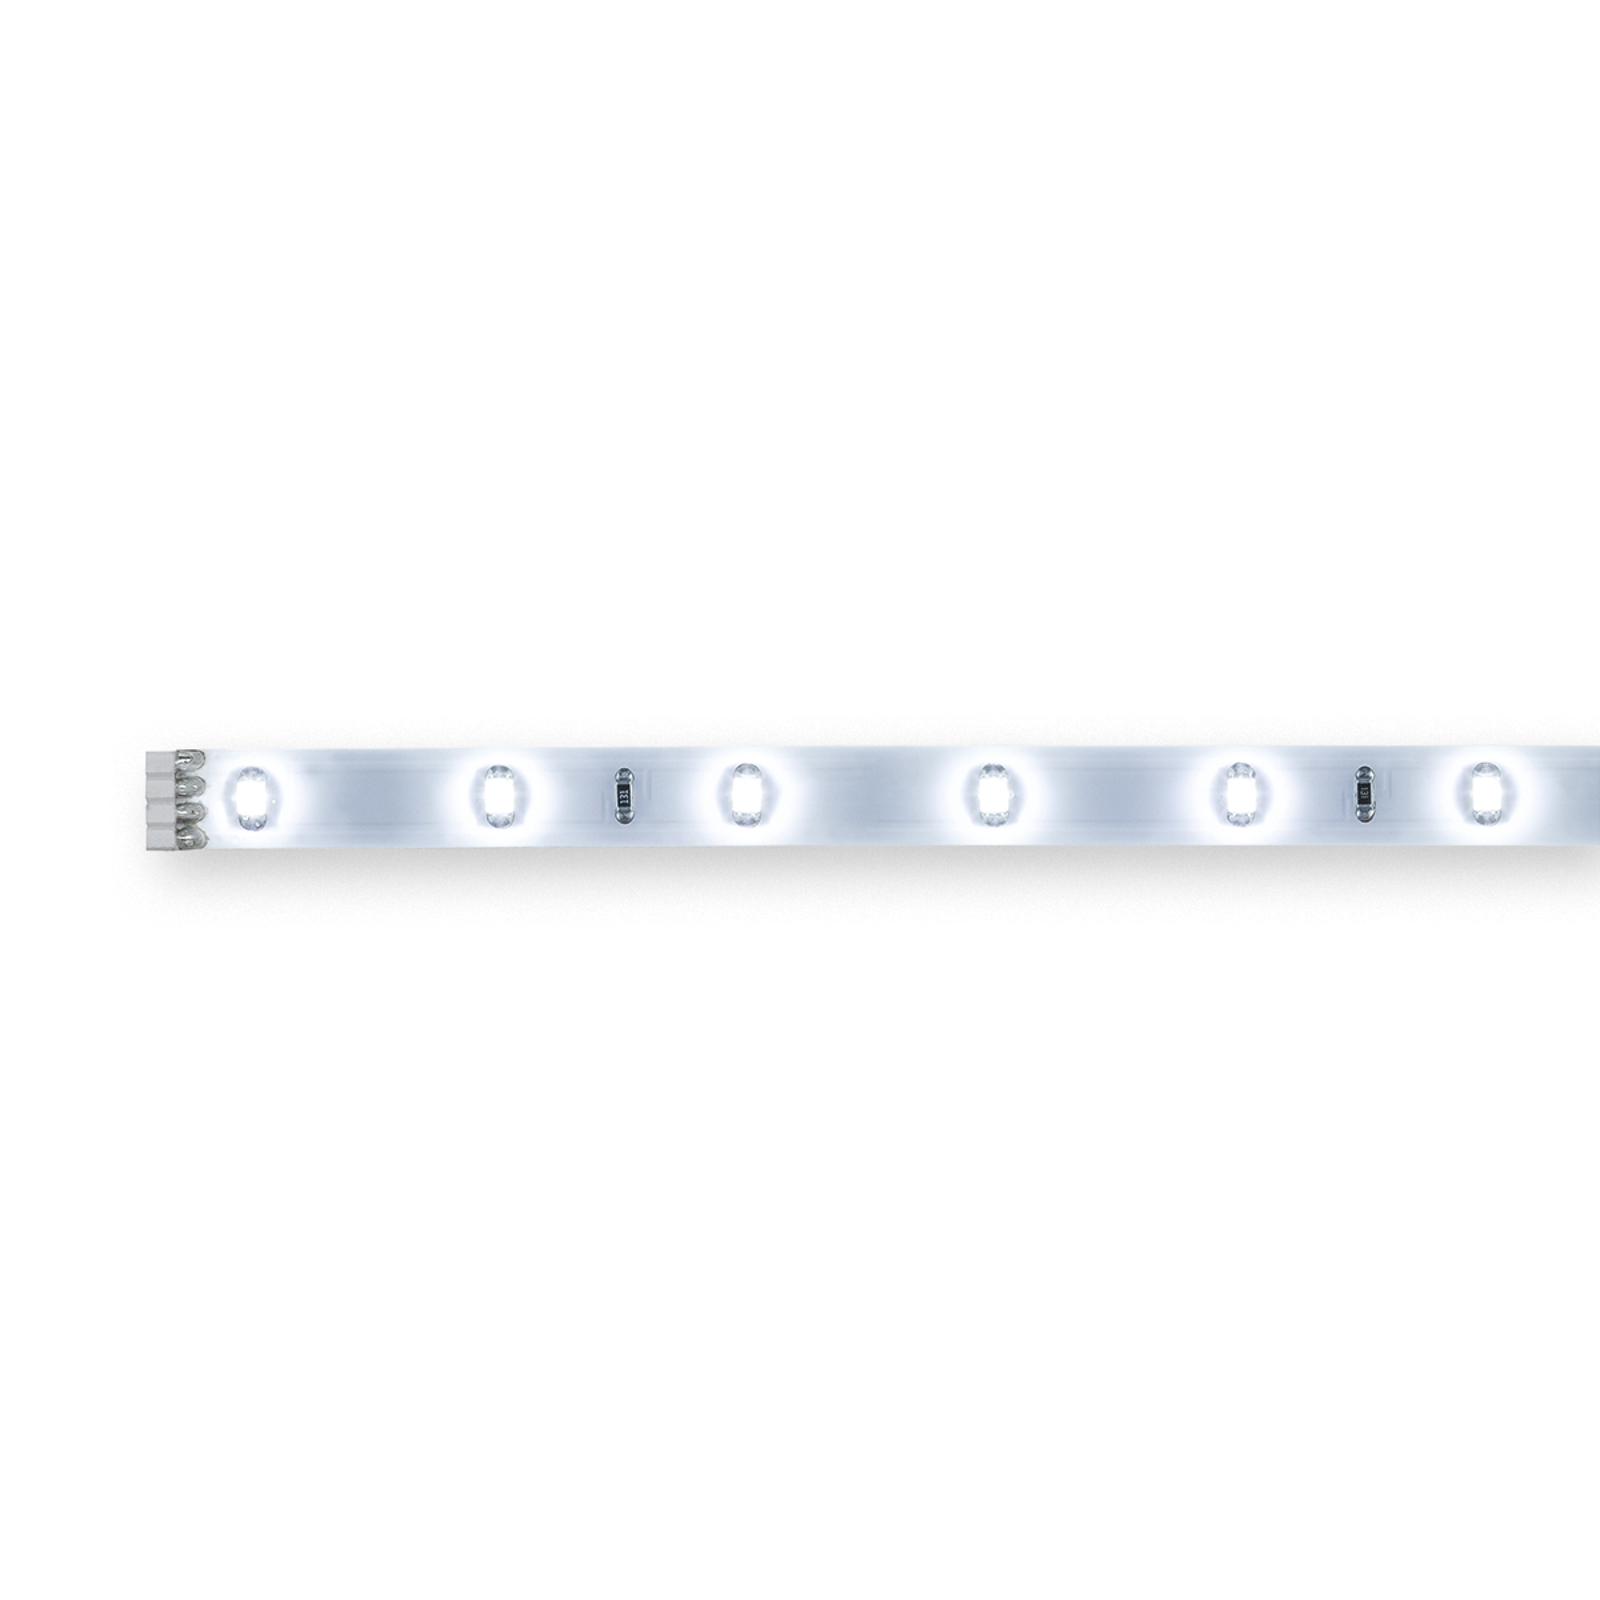 Strip YourLED lunghezza 97,5 cm, tonalità diurna Illuminazione per interni